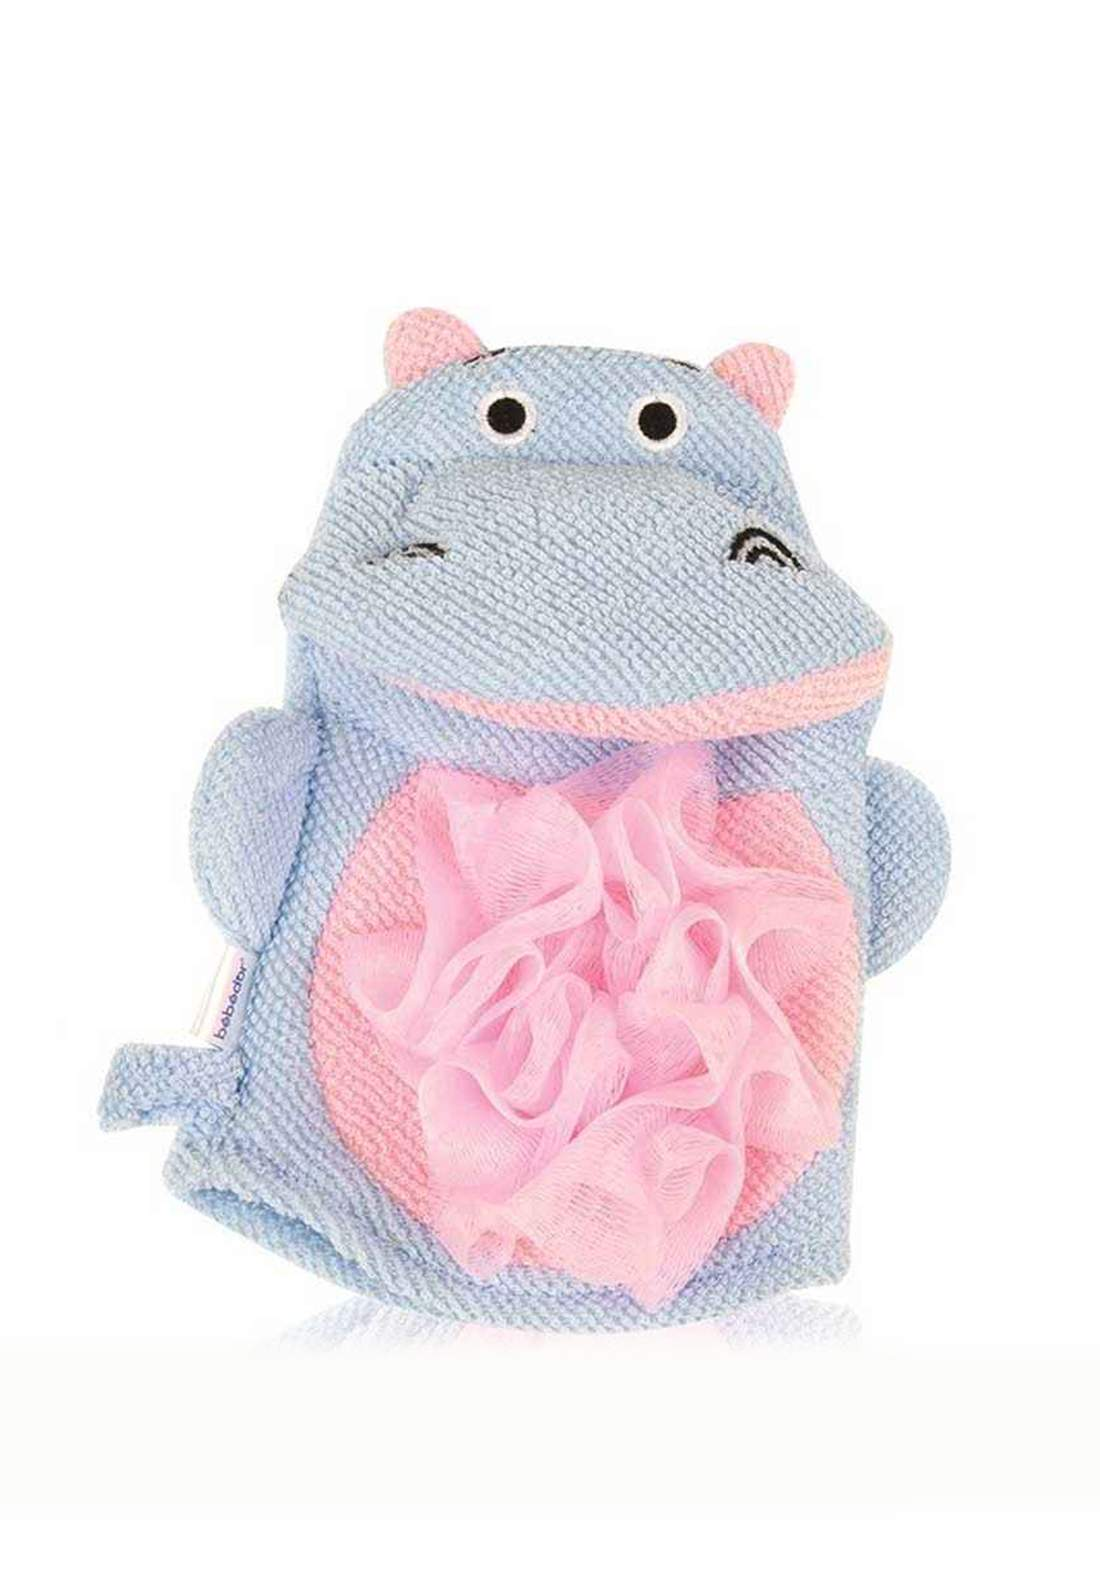 Bebedor 582 Fiber Bath Puppet Blue Hippo ليفة استحمام للاطفال